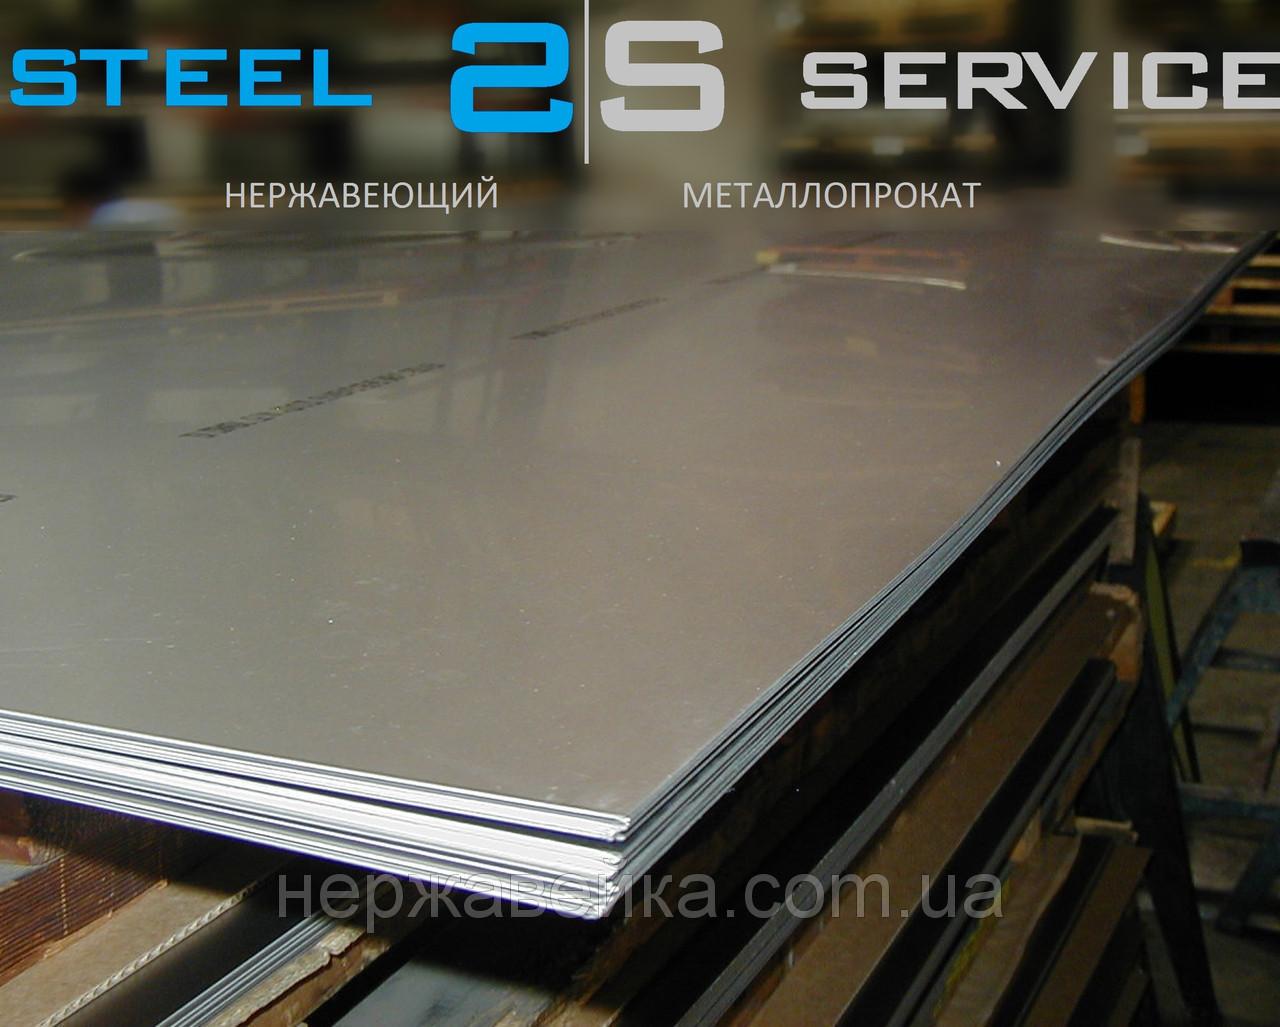 Нержавейка лист 12х1000х2000мм AISI 430(12Х17) 2B - матовый, технический